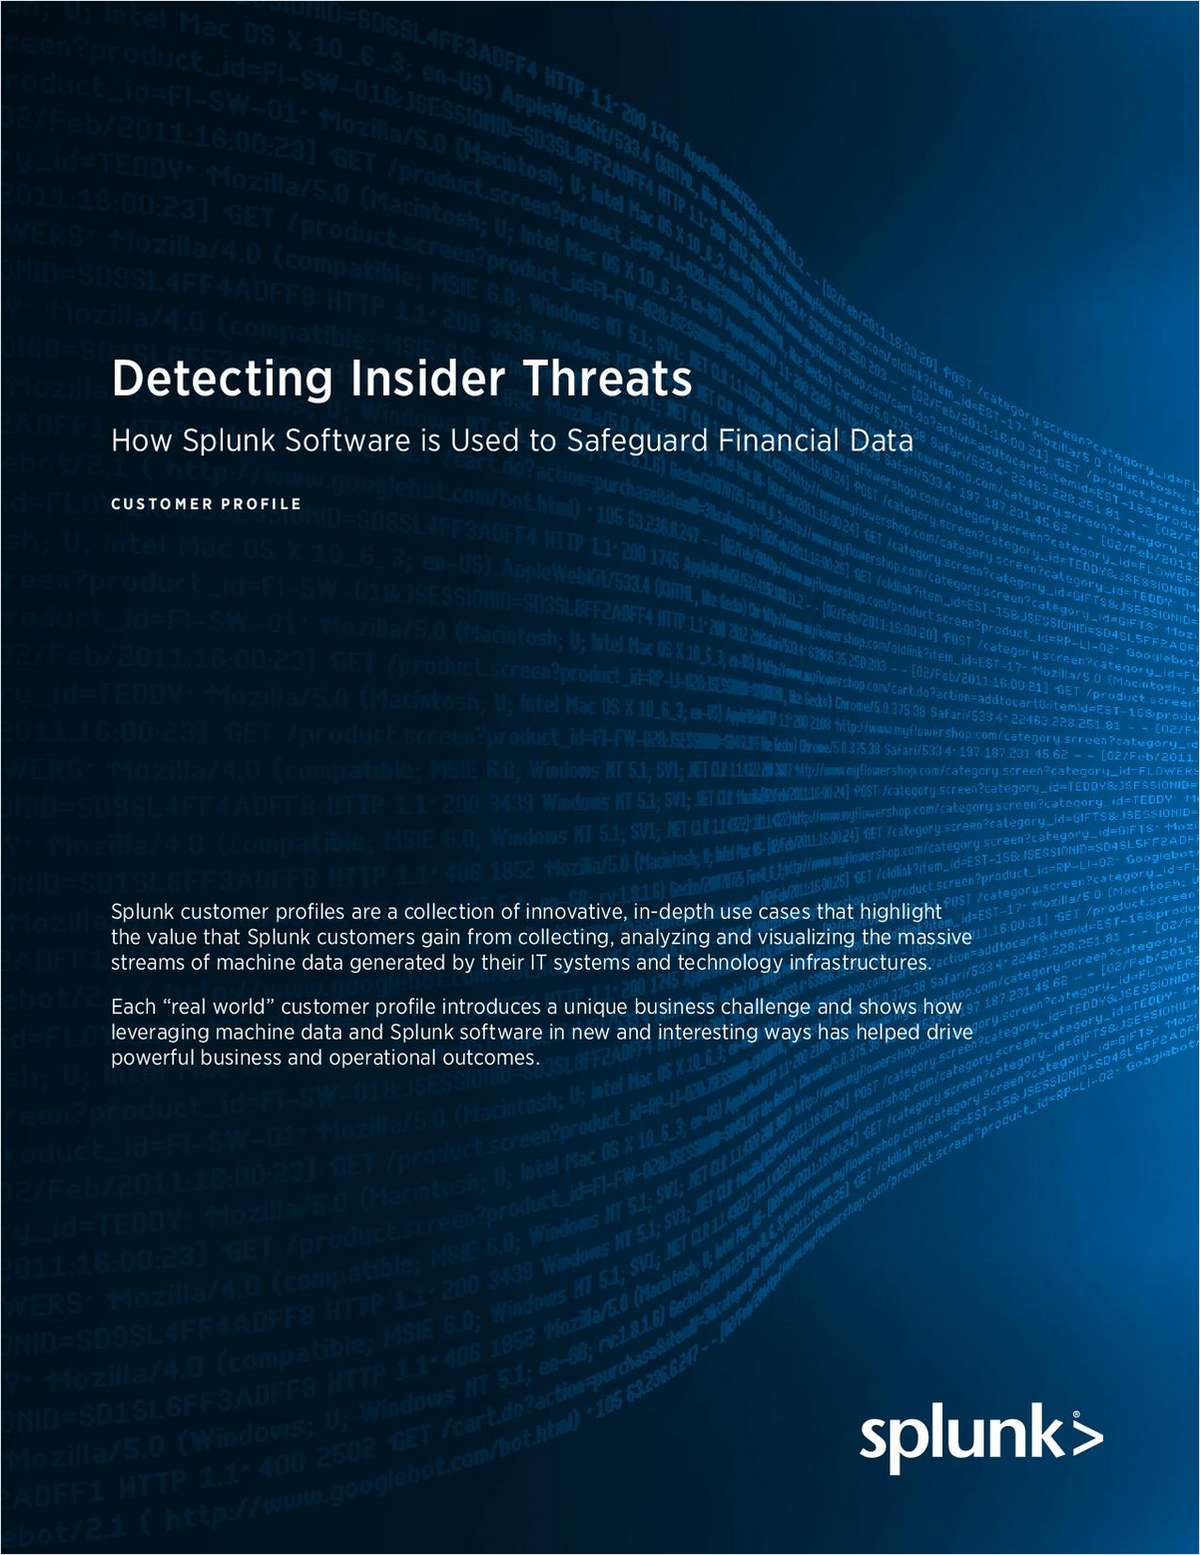 Detecting Insider Threats